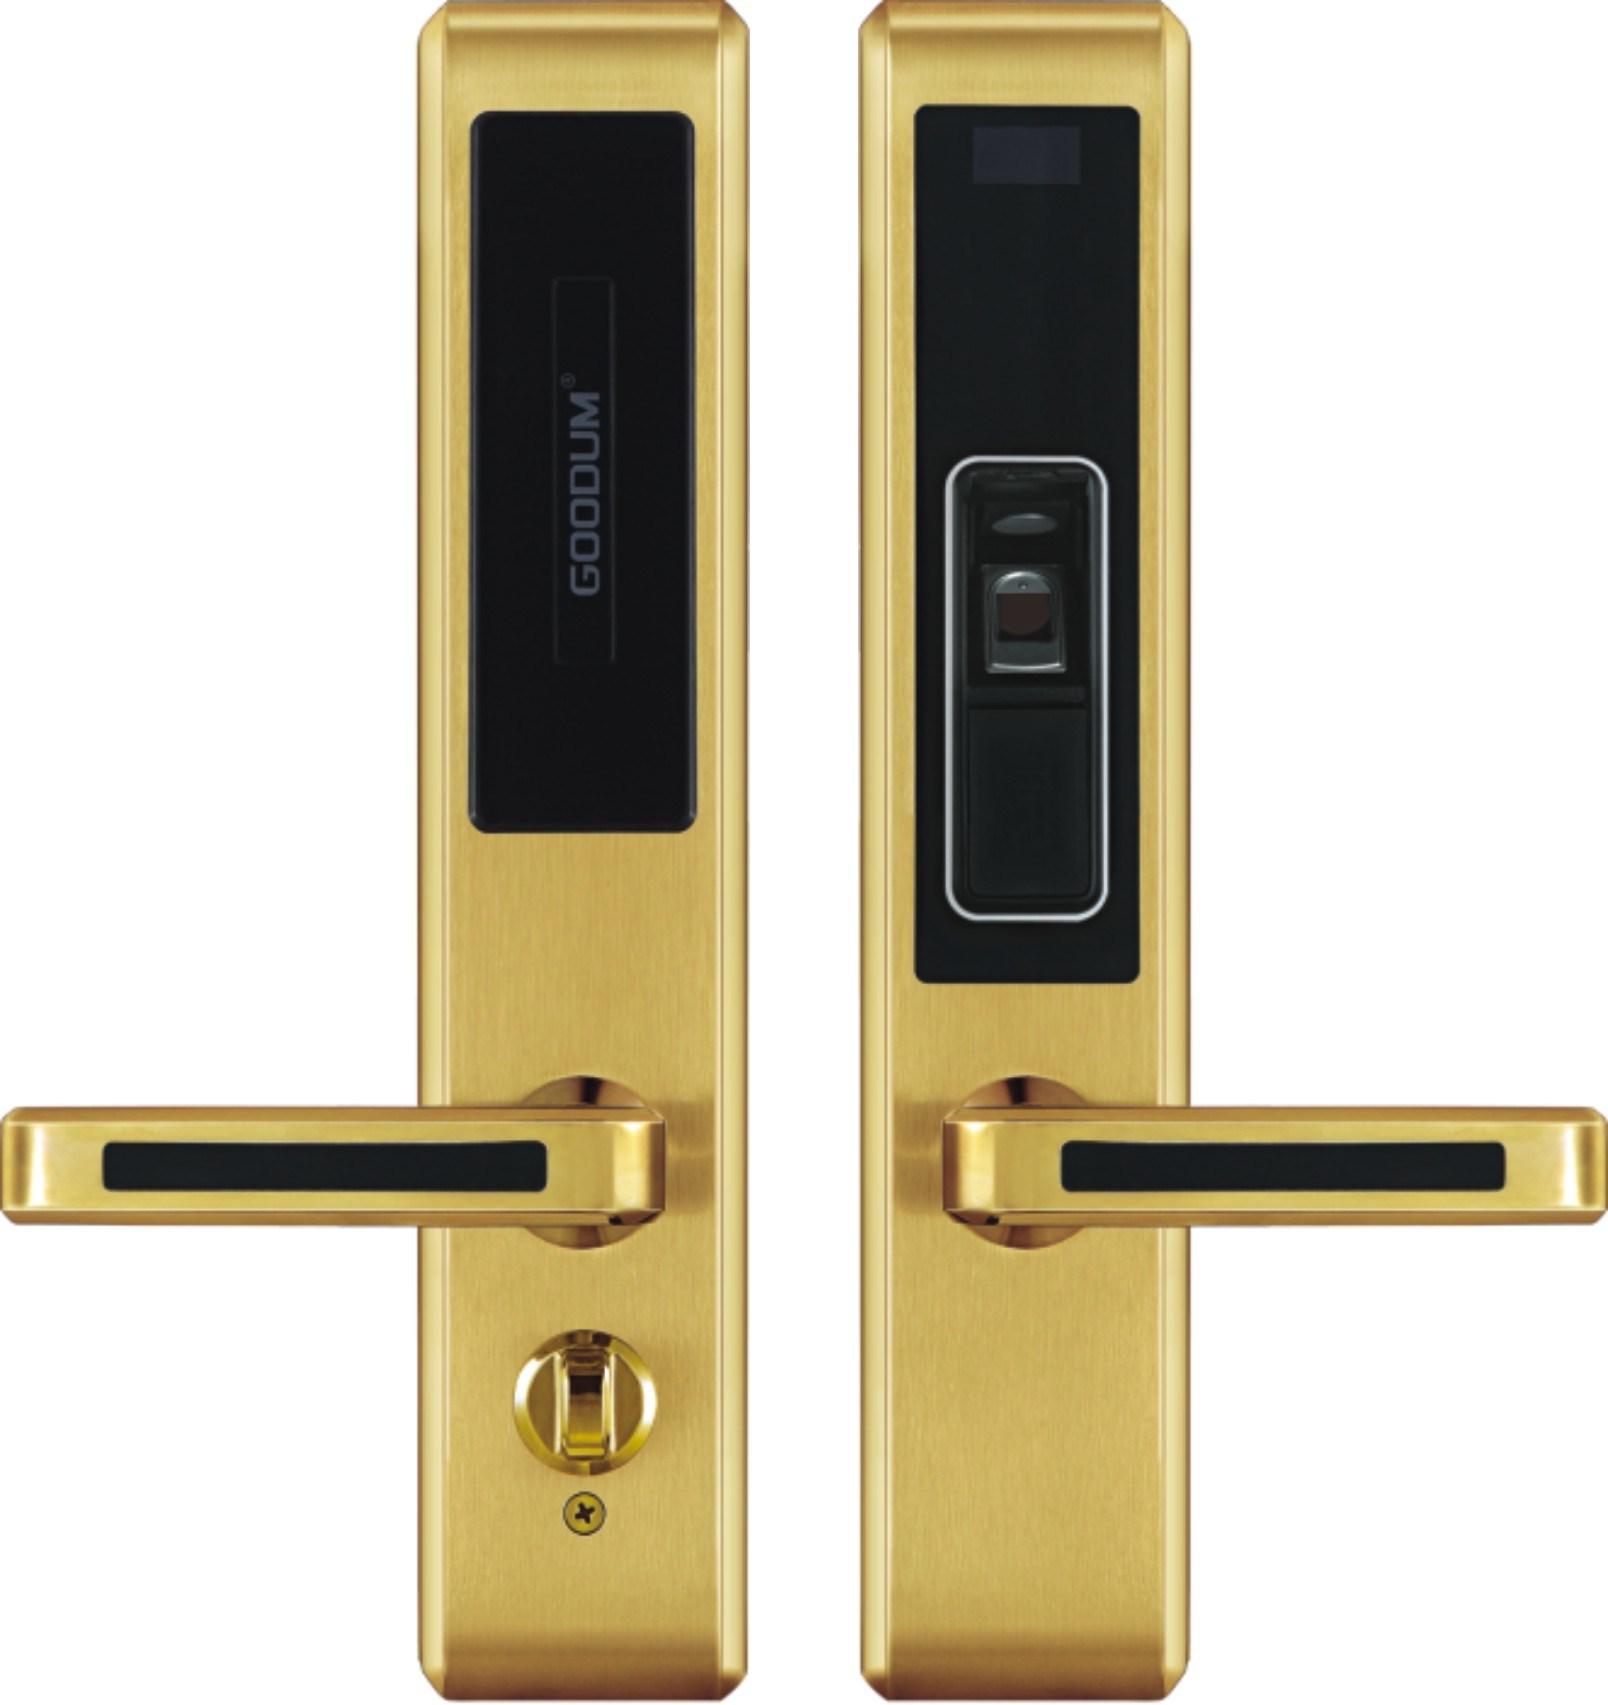 China Biometric Fingerprint Keyless Keypad Password Access Control Gold Digital Door Lock Electronic System Locks Smart